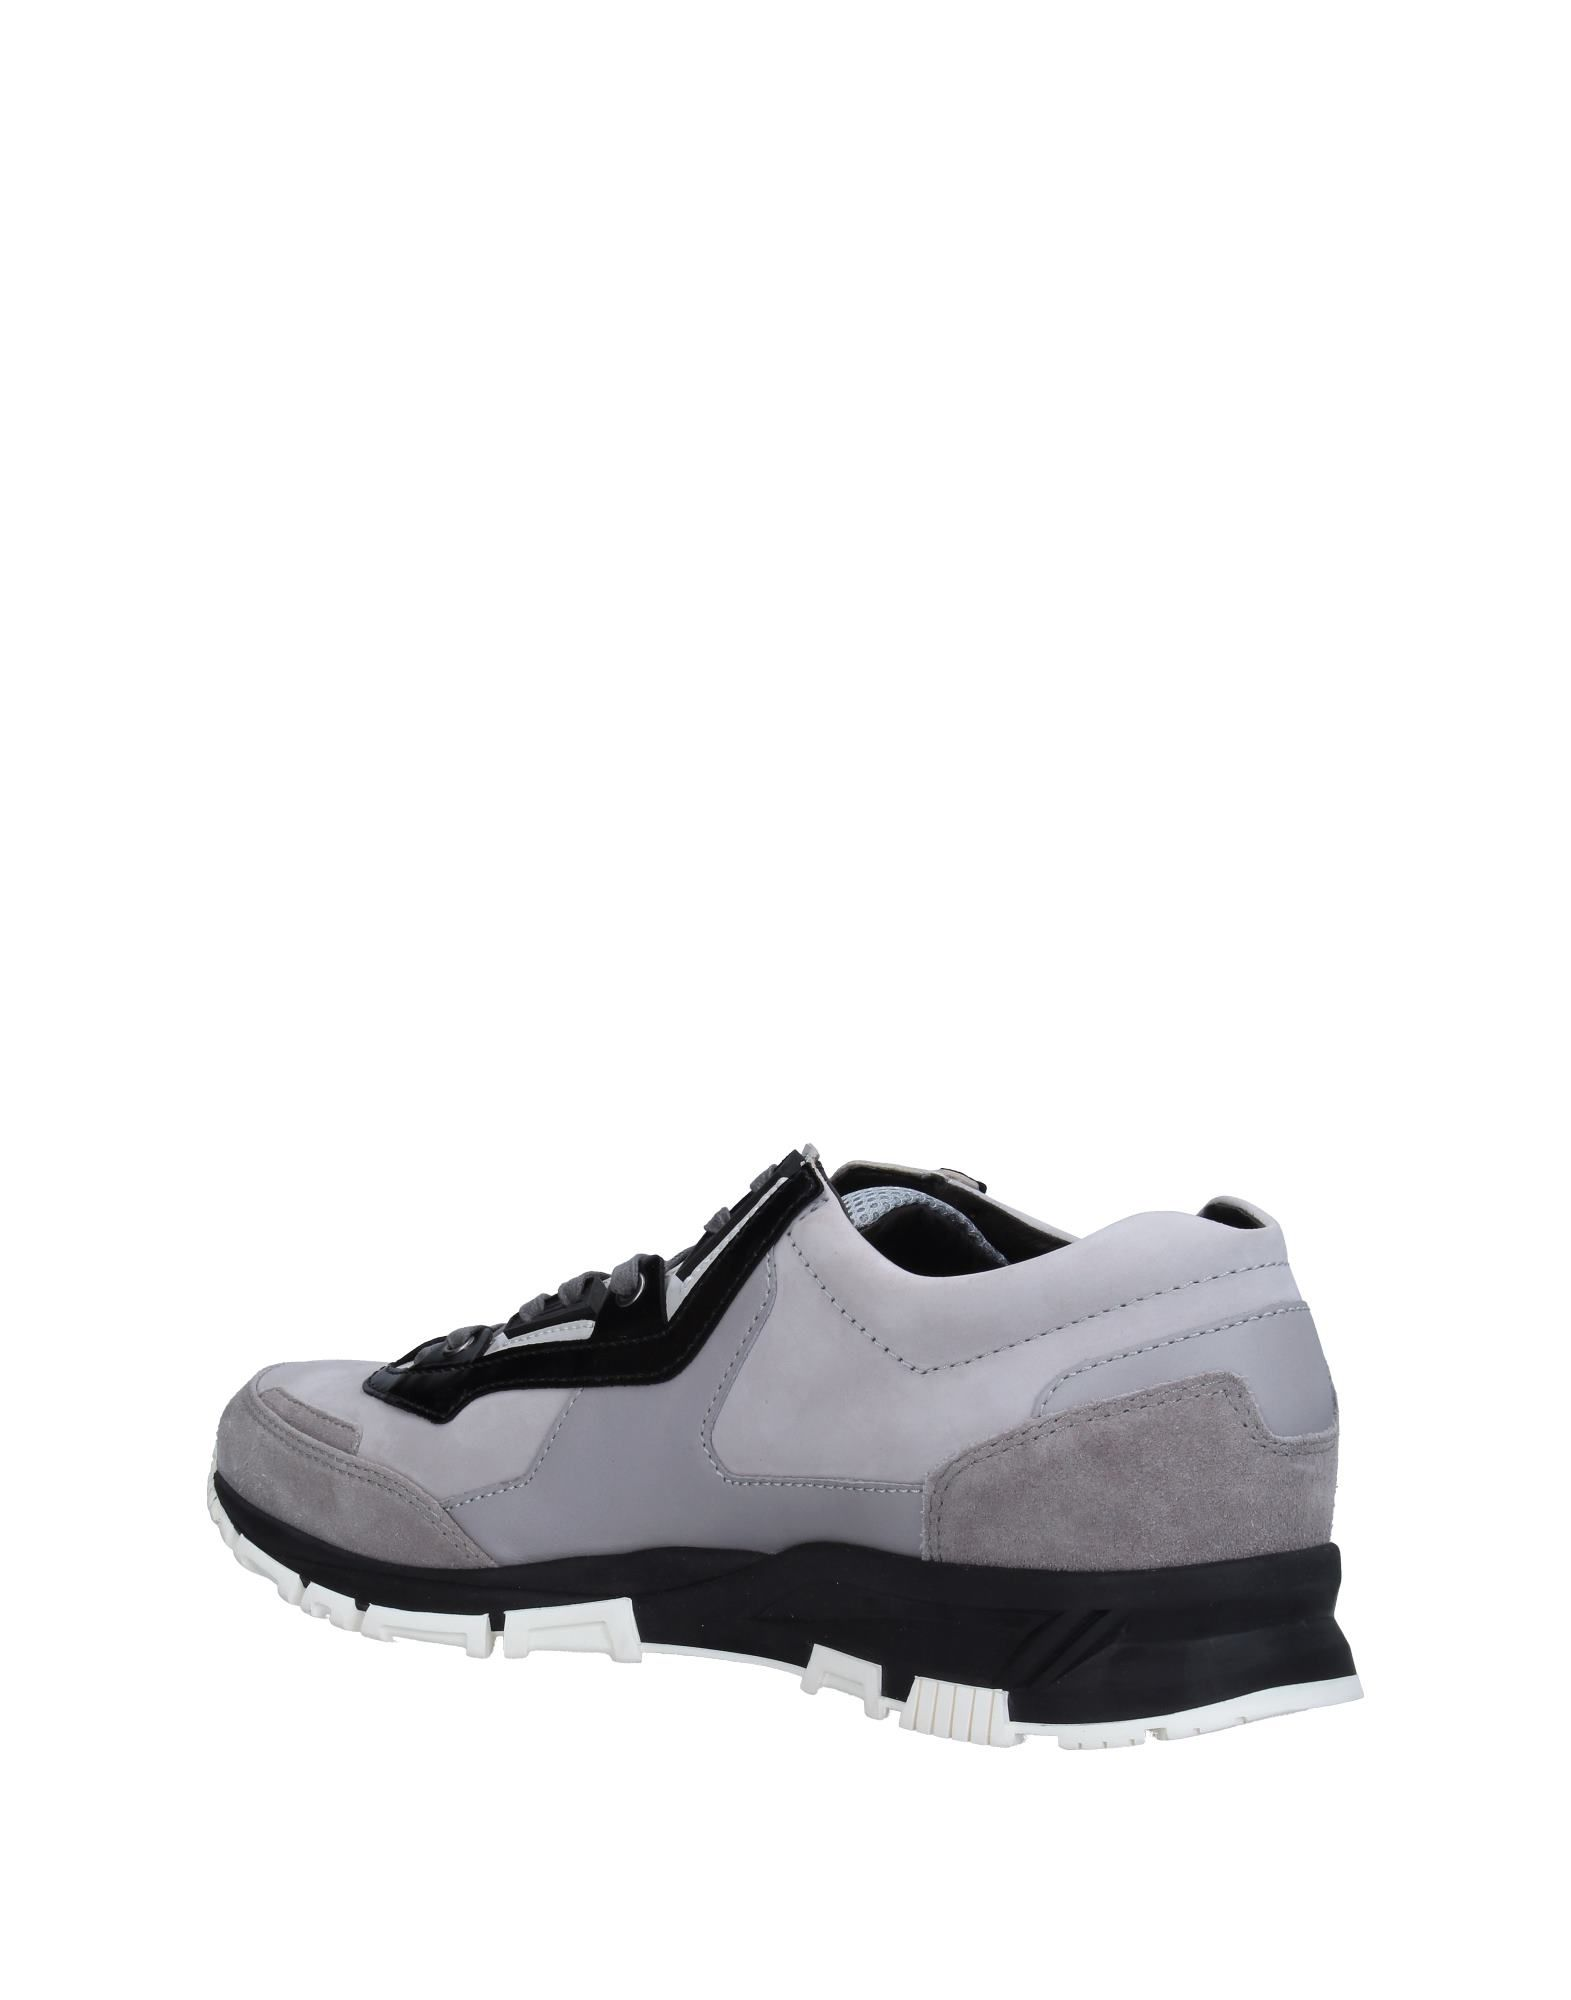 Lanvin Sneakers Herren  11300413HT Schuhe Gute Qualität beliebte Schuhe 11300413HT 375daf